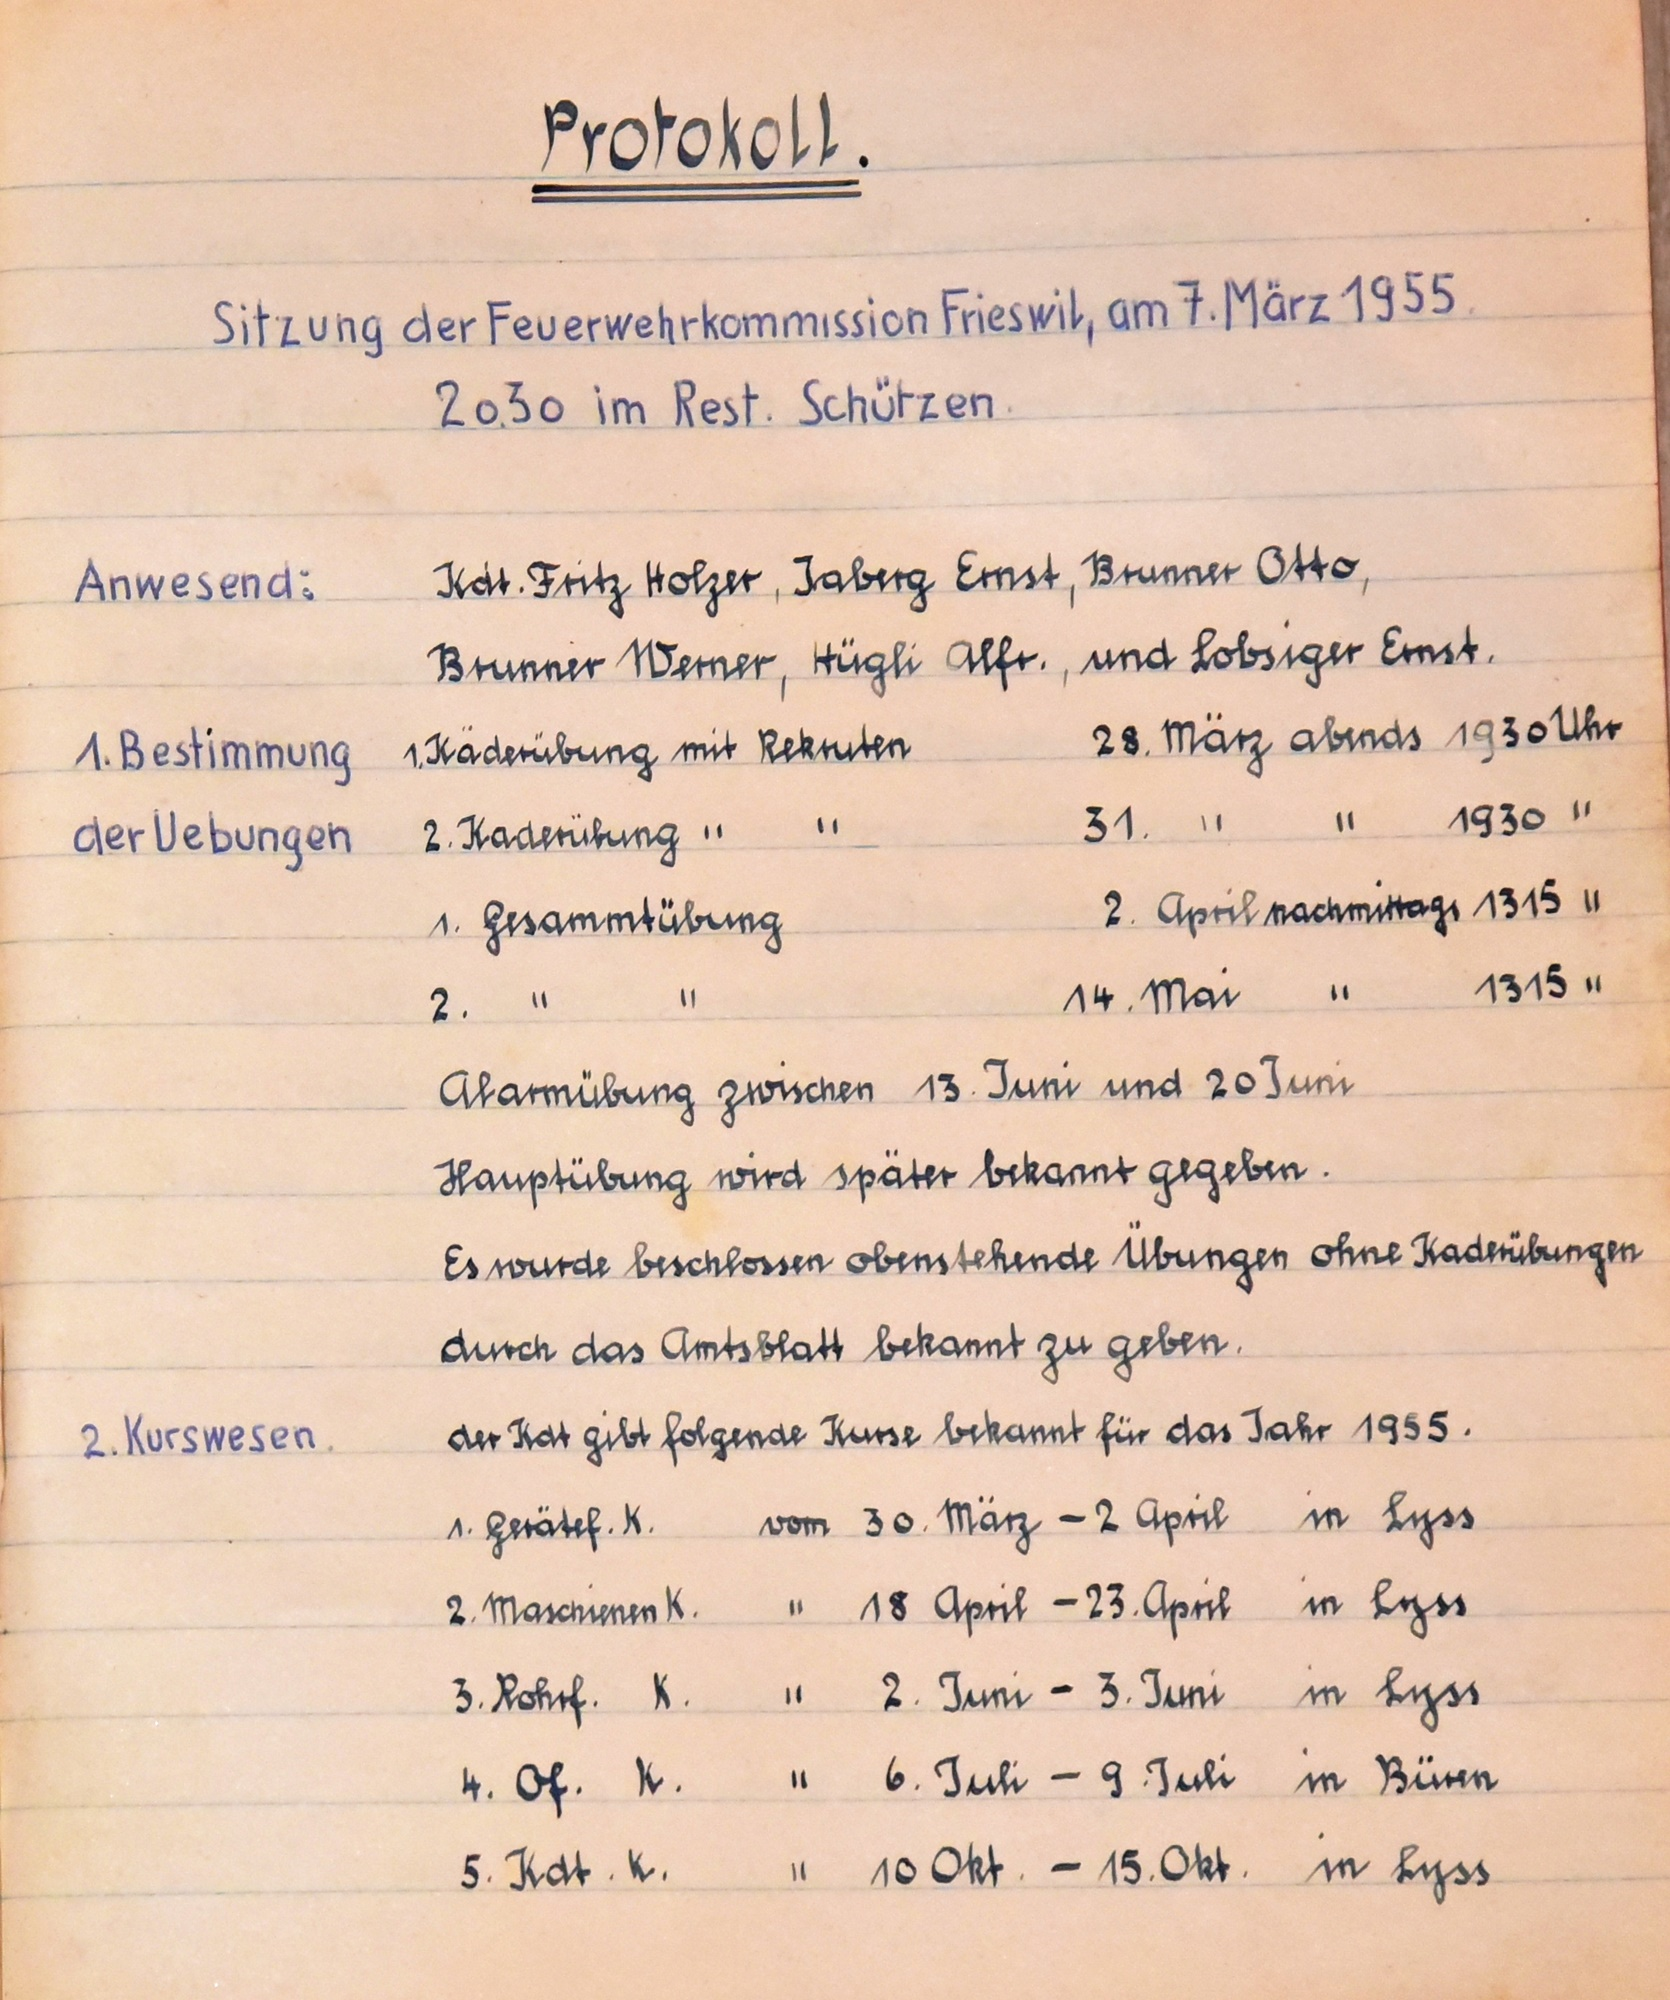 1955 Protokoll Frieswil